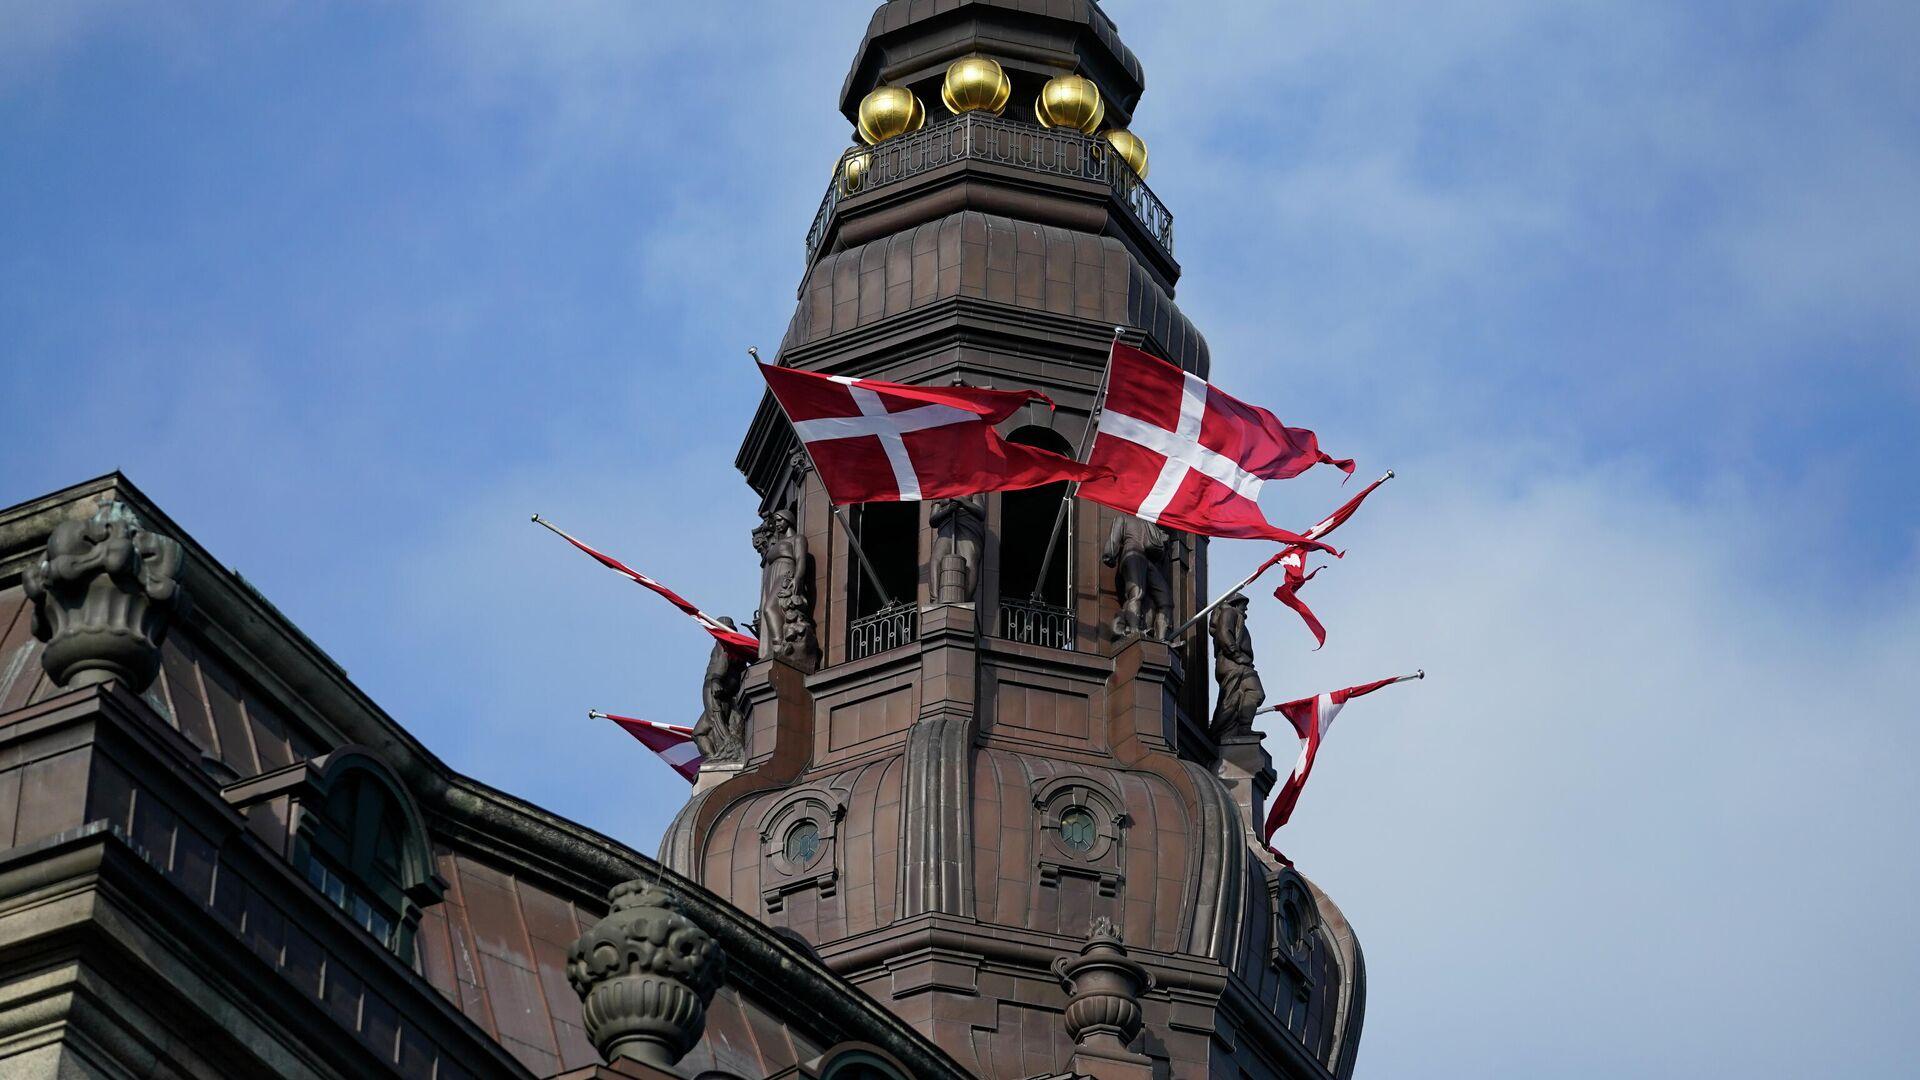 Das Parlamentsgebäude in Kopenhagen, Dänemark (Schloss Christiansborg) - SNA, 1920, 28.02.2021